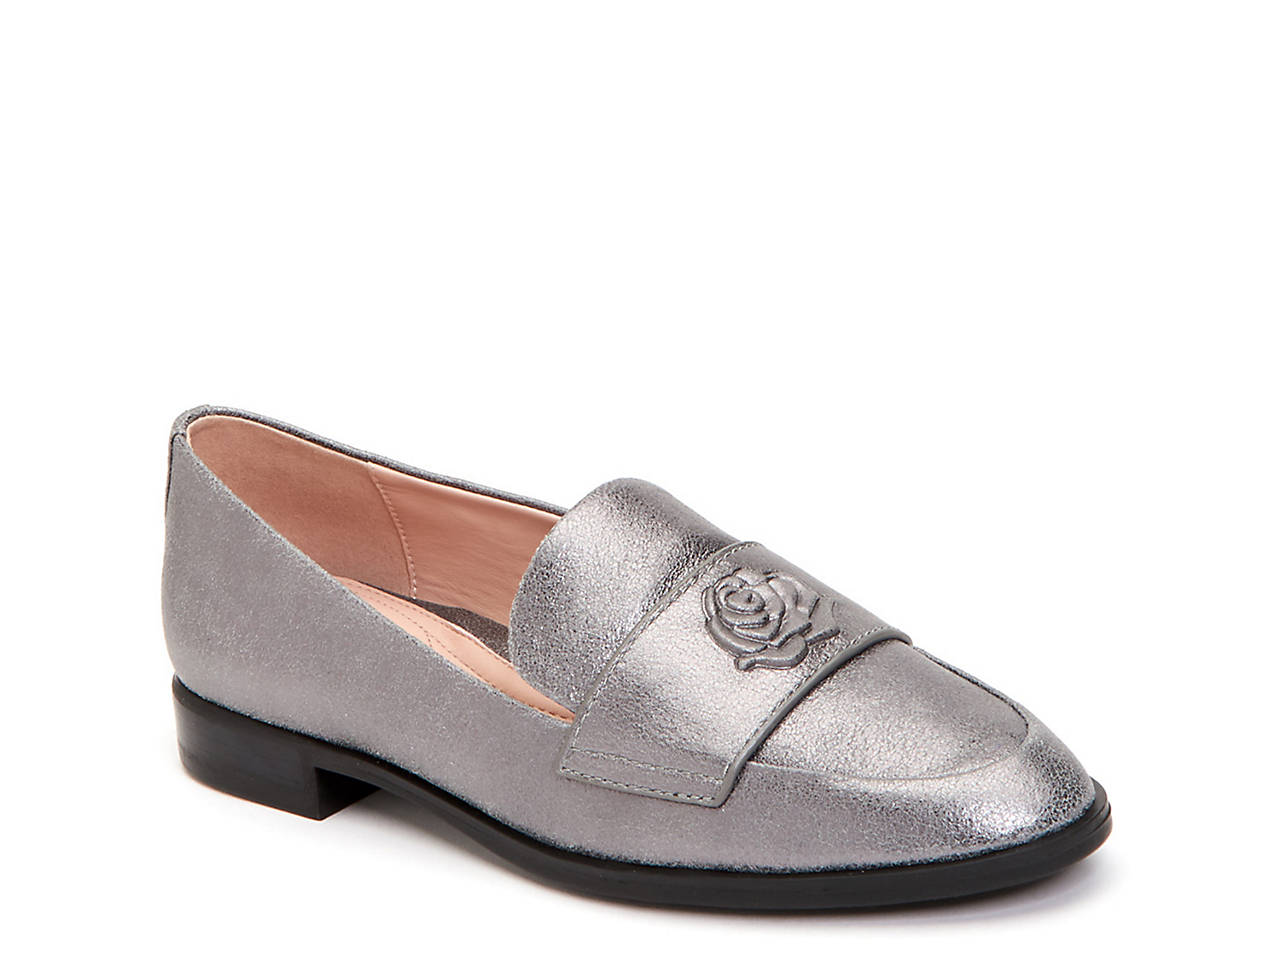 d3dc1c3b8889 Taryn Rose Blossom Loafer Women s Shoes